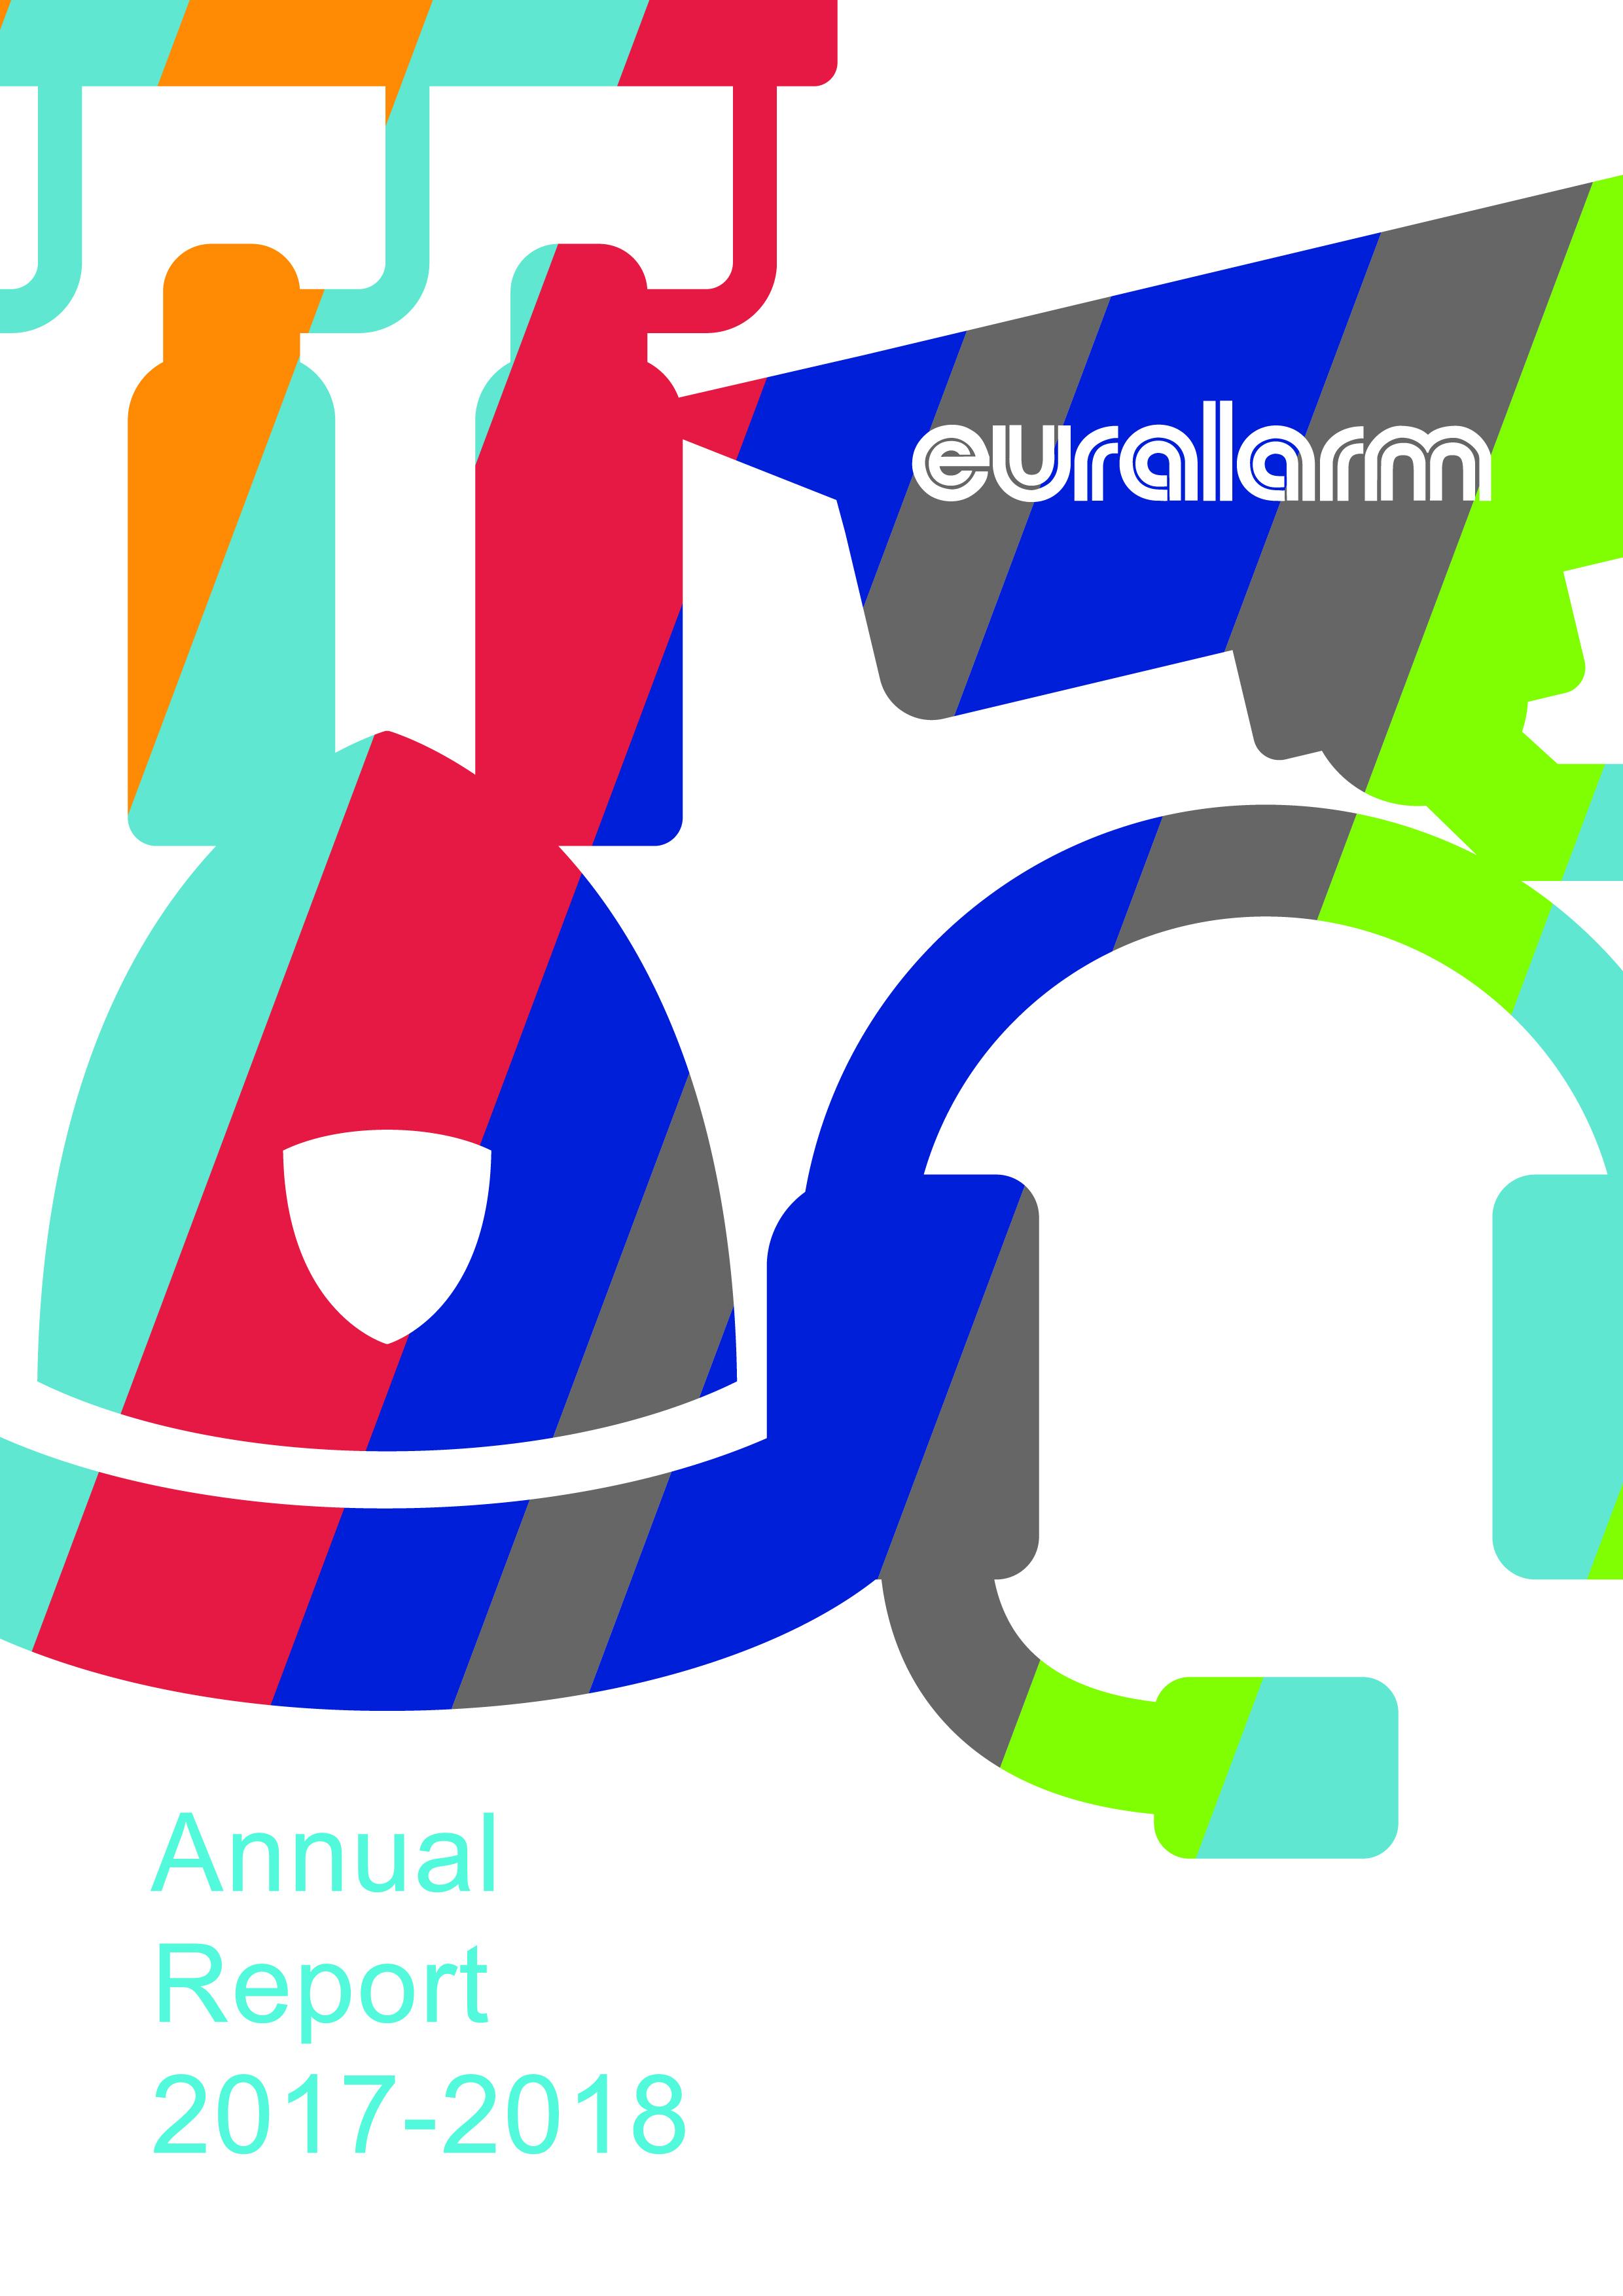 euralarm-annual-report-2017-2018.indd